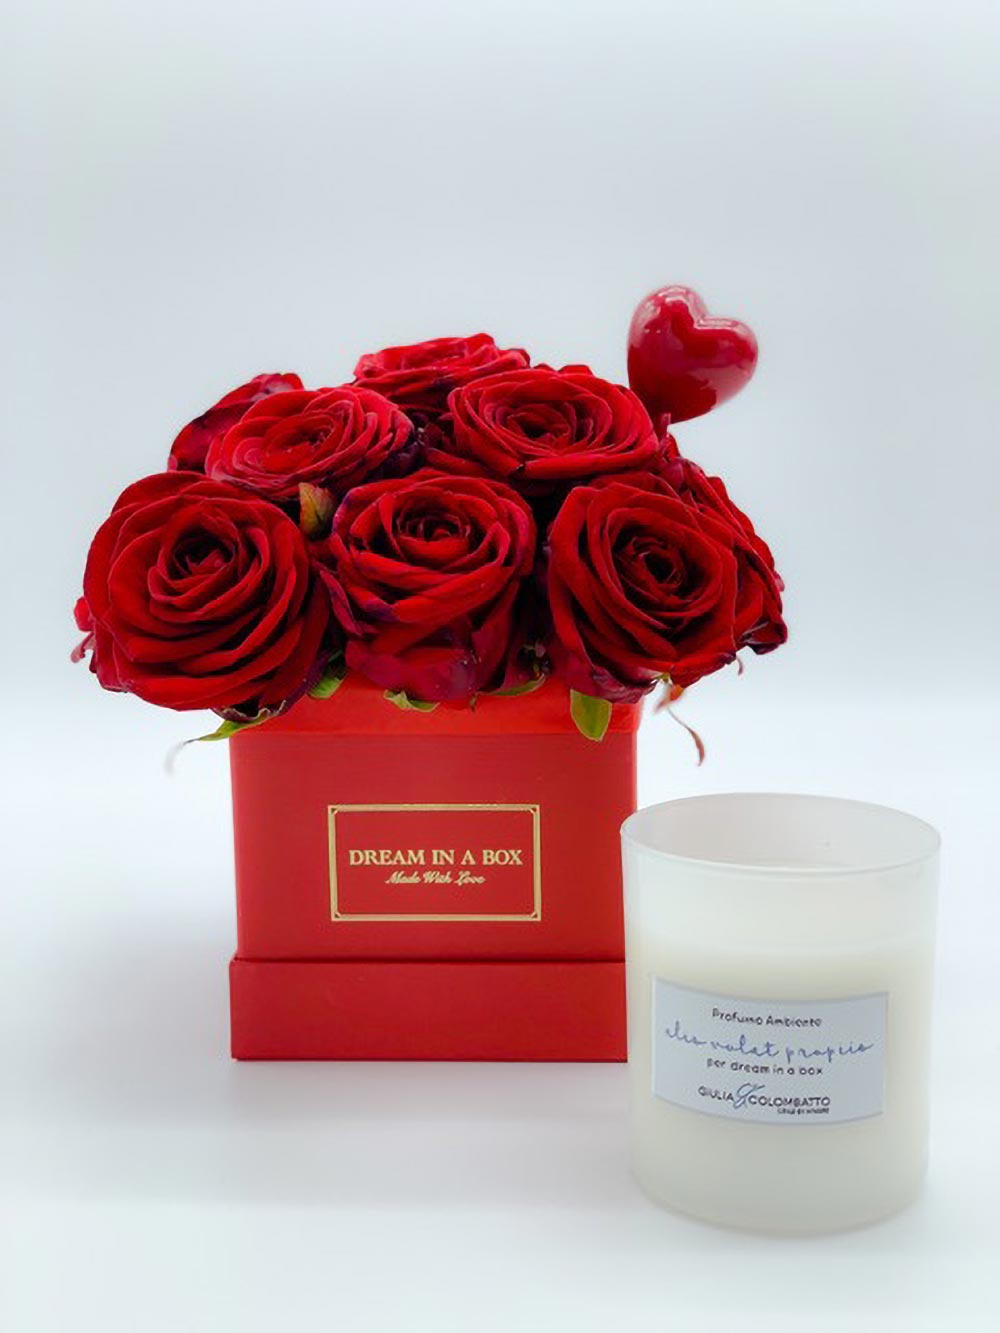 mini square san valentino special package rose rosse fresche e candela dreaming rose